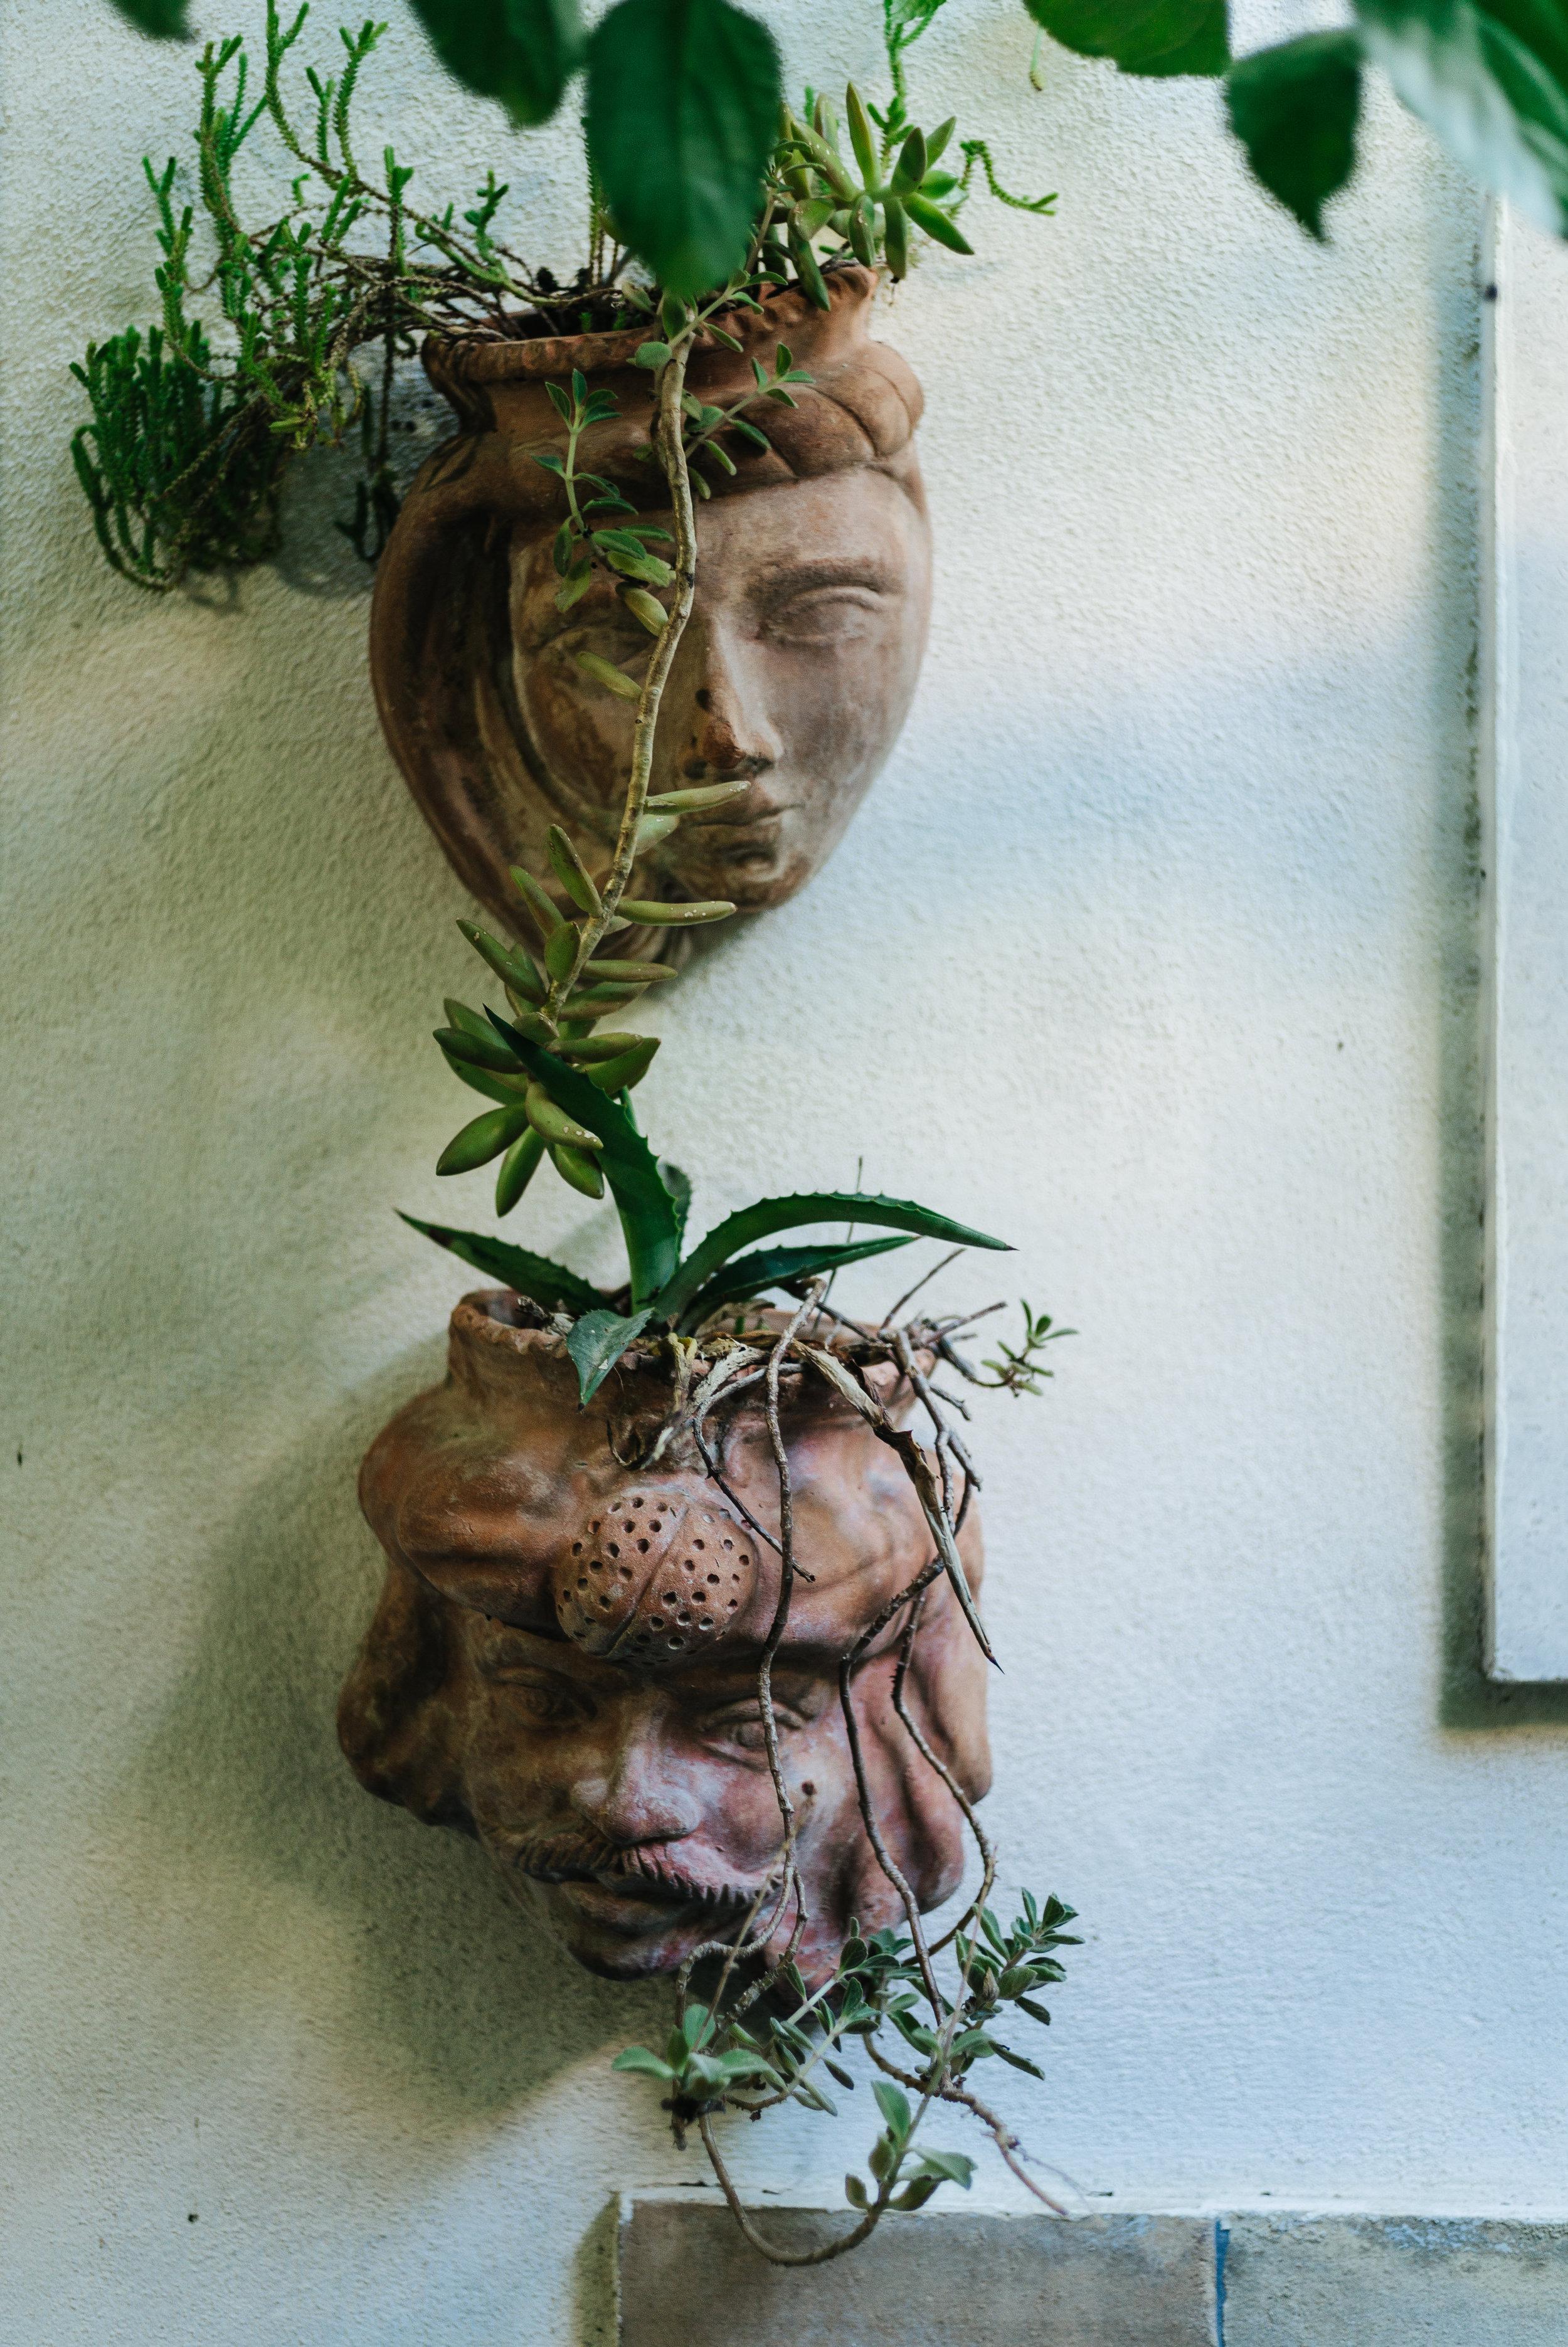 39sampieri-casa-vacanze-sicilia-appartamento-sicily-holiday-apartment-casazzurra-italia-italy.jpg